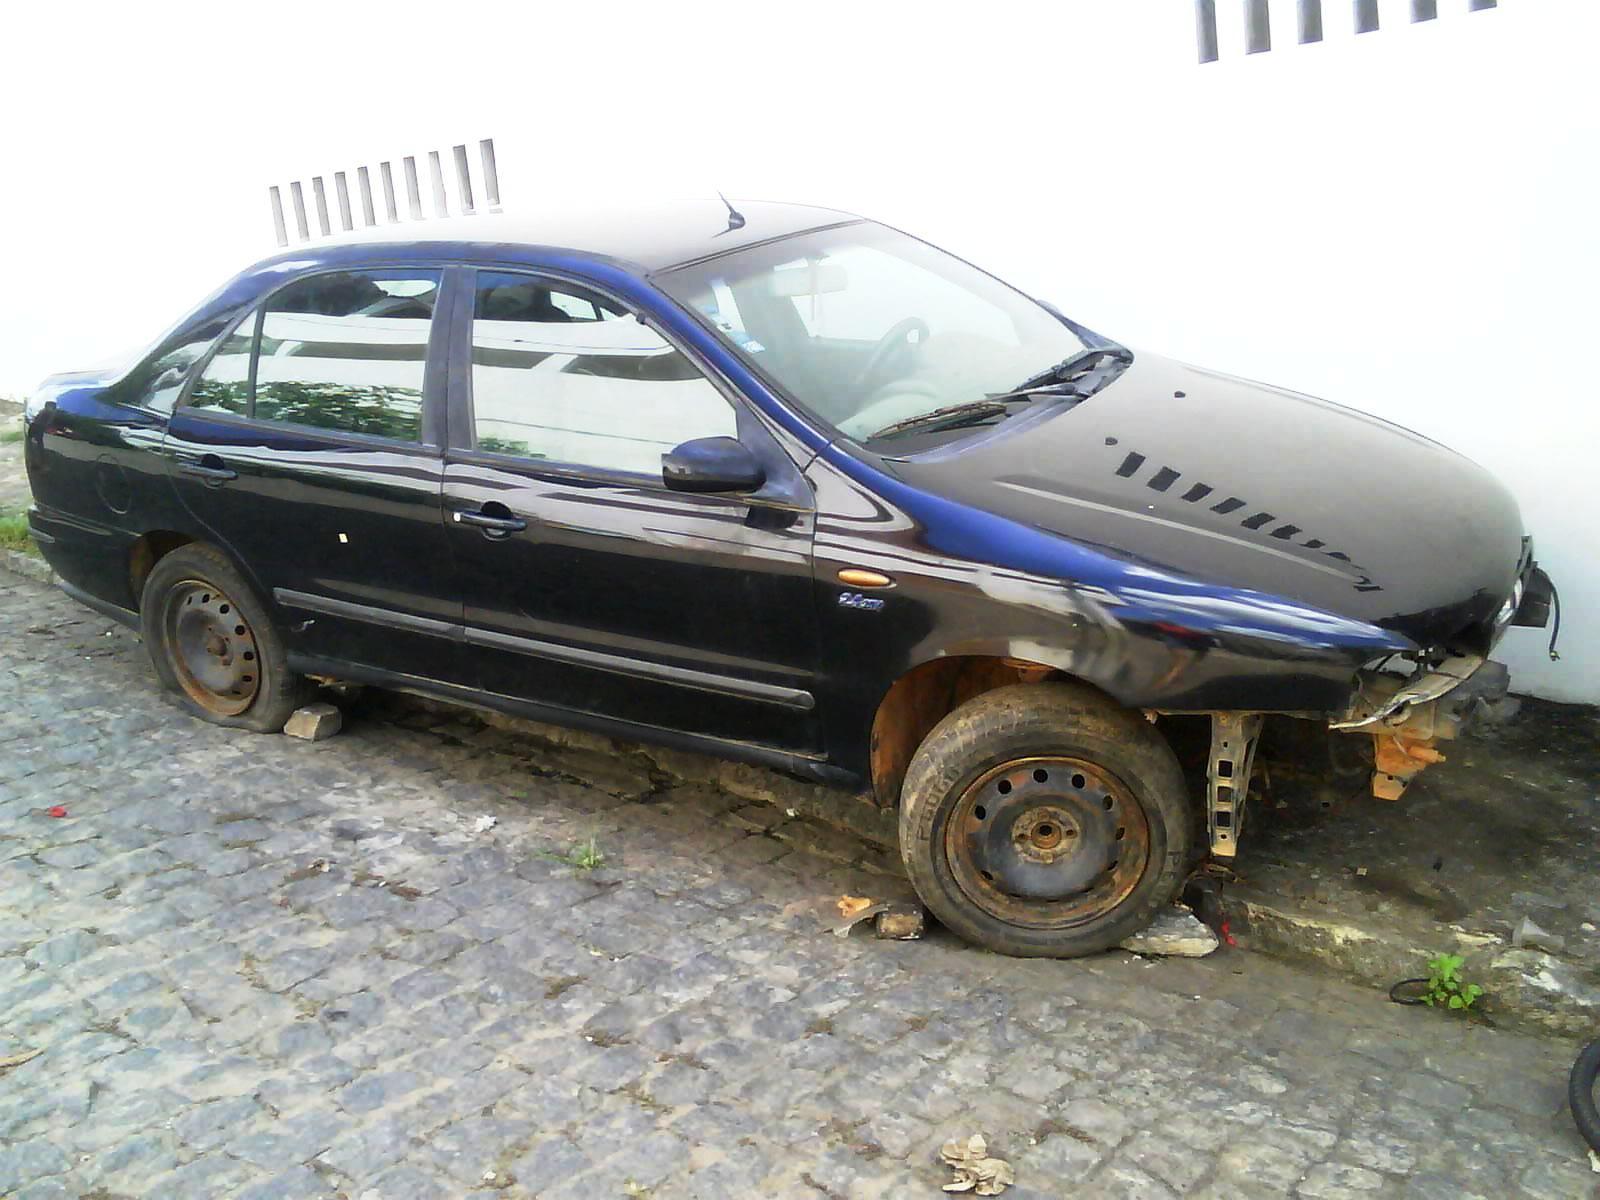 Fiat Marea -- Carros Inúteis ea1a4b73cb